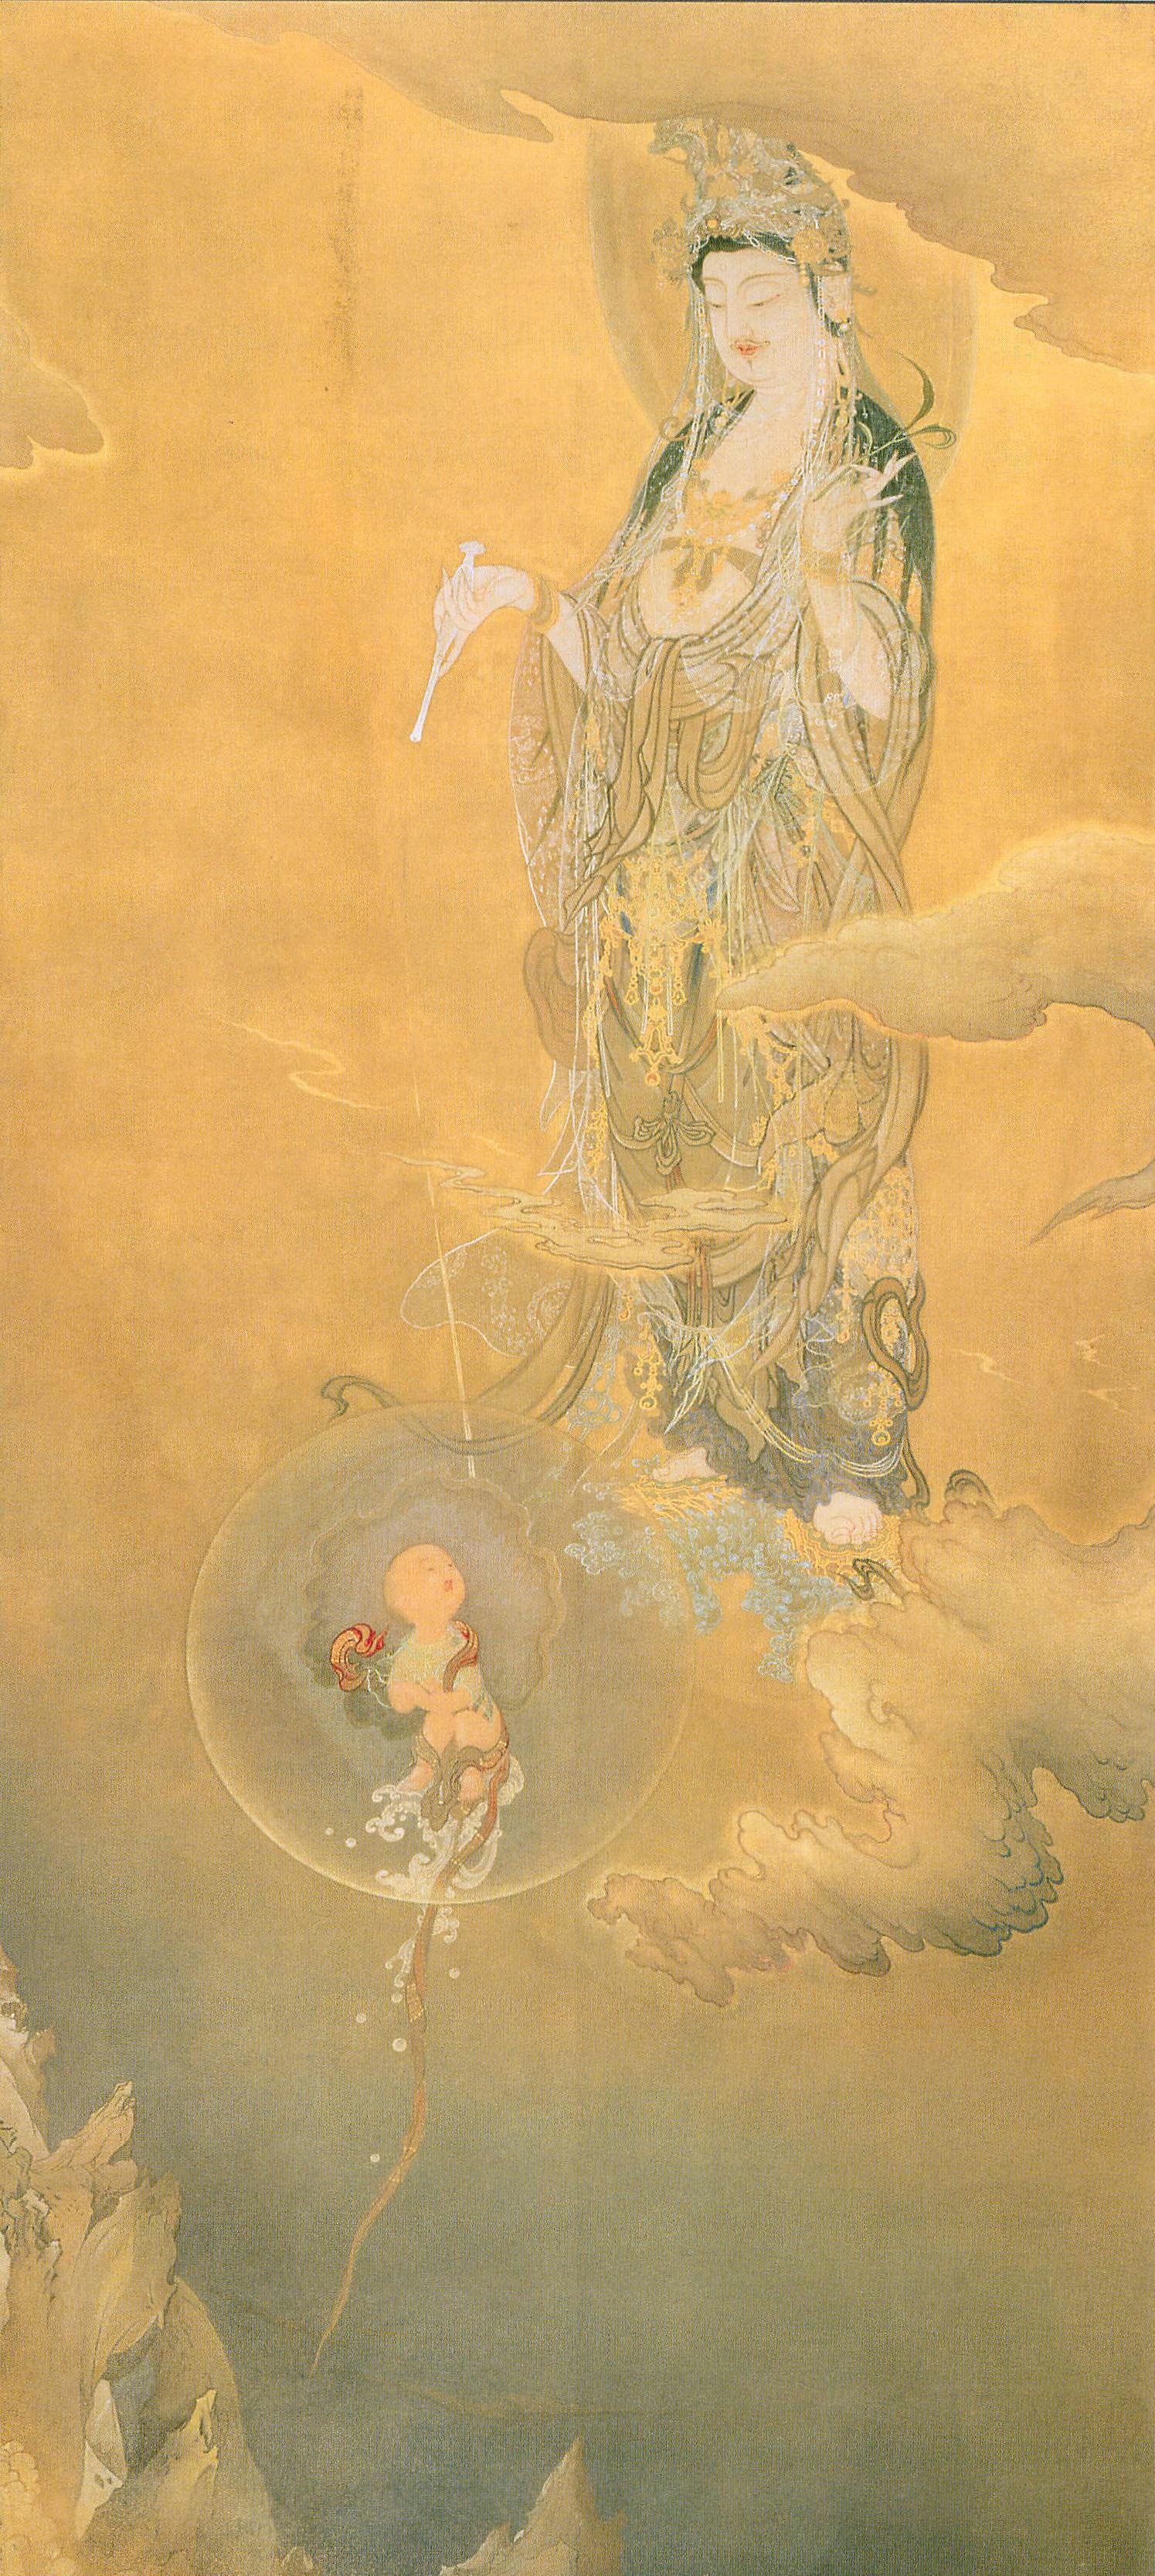 狩野芳崖の画像 p1_29